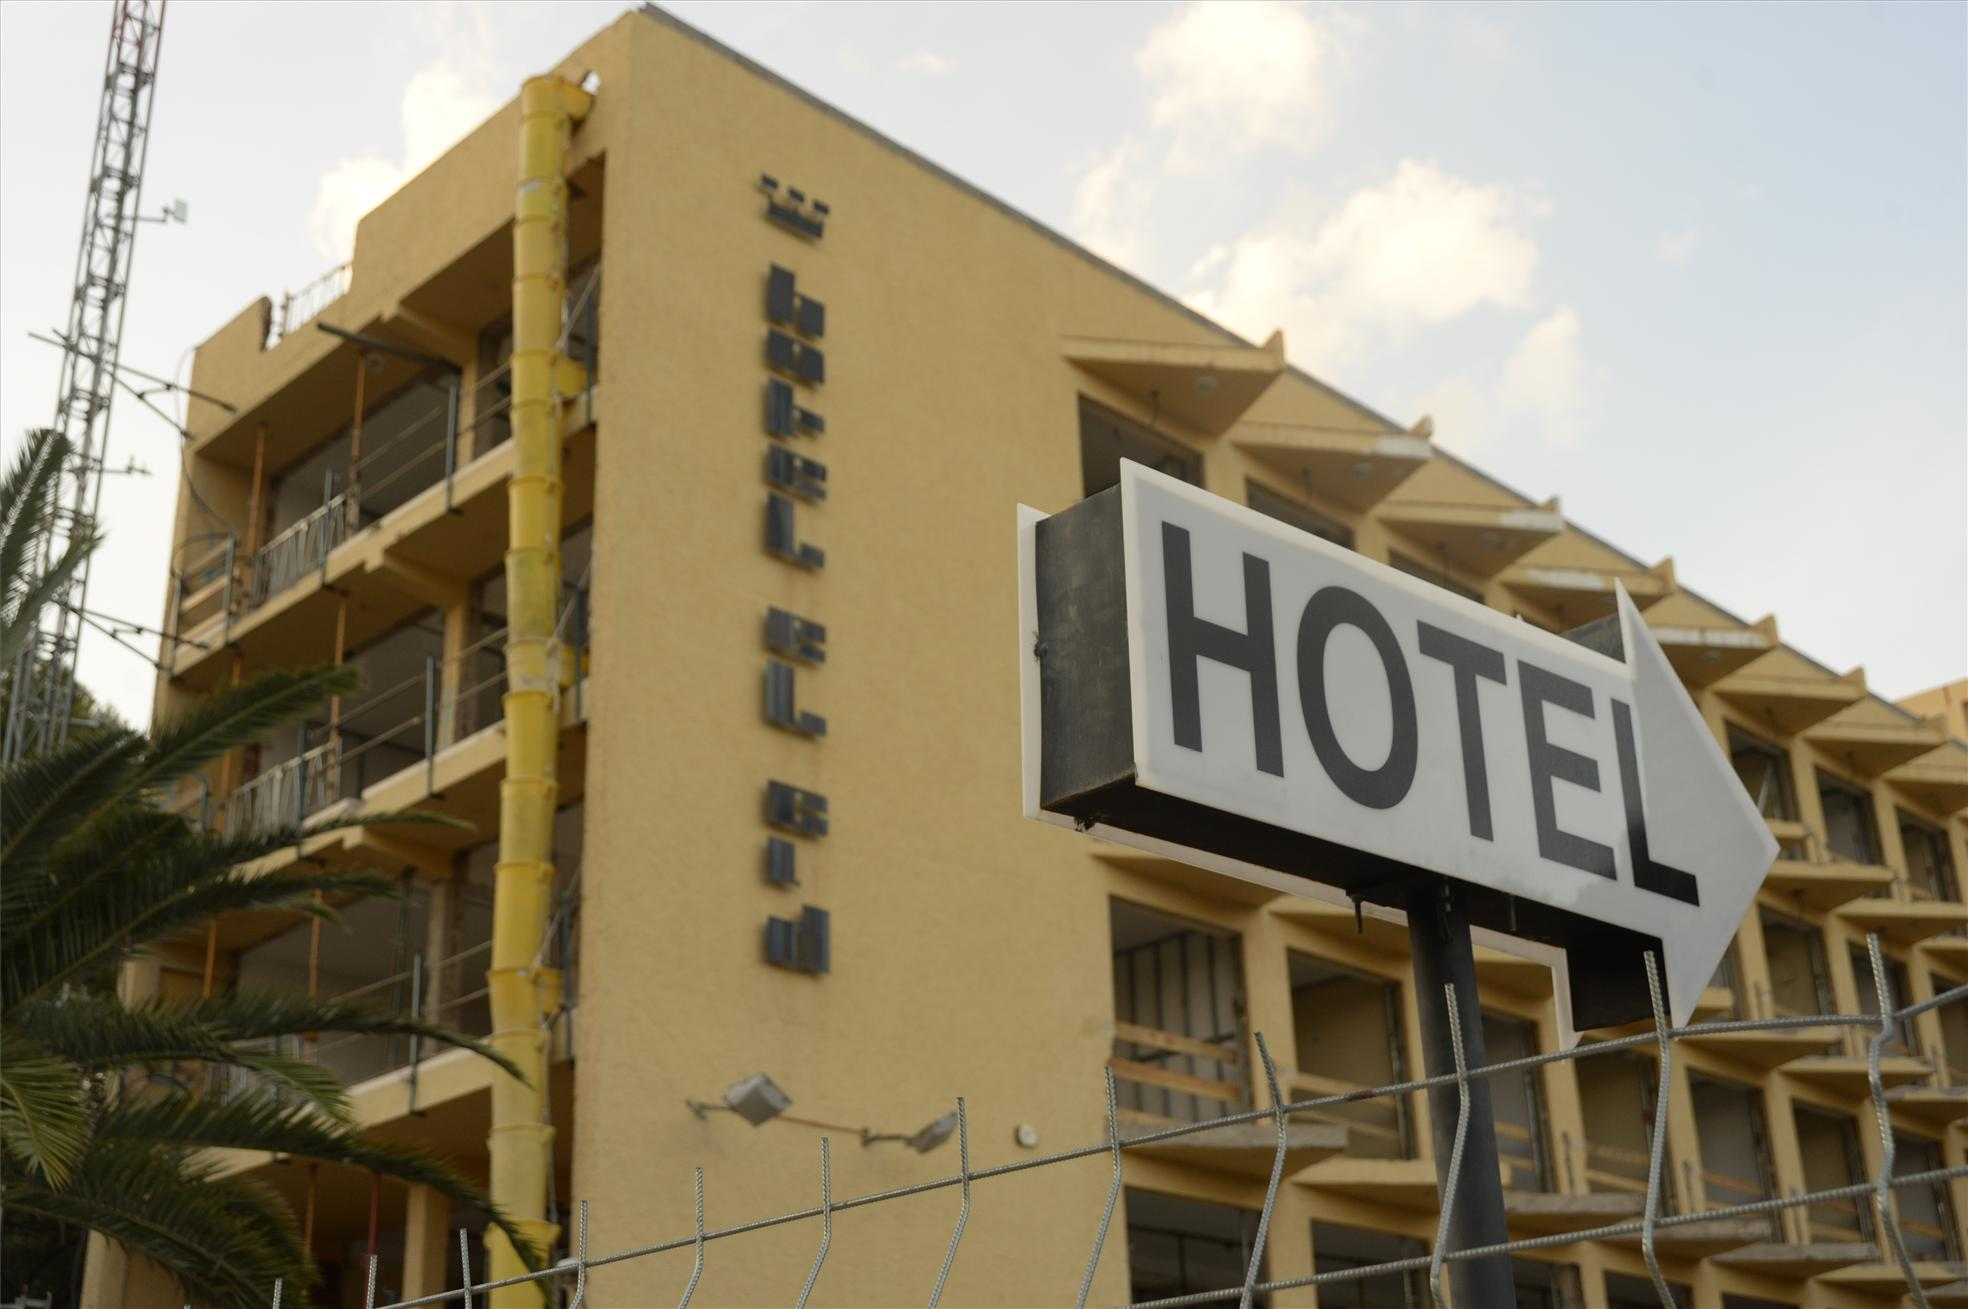 REHABILITACI N INTEGRAL HOTEL EL CID Demolici n y refuerzo